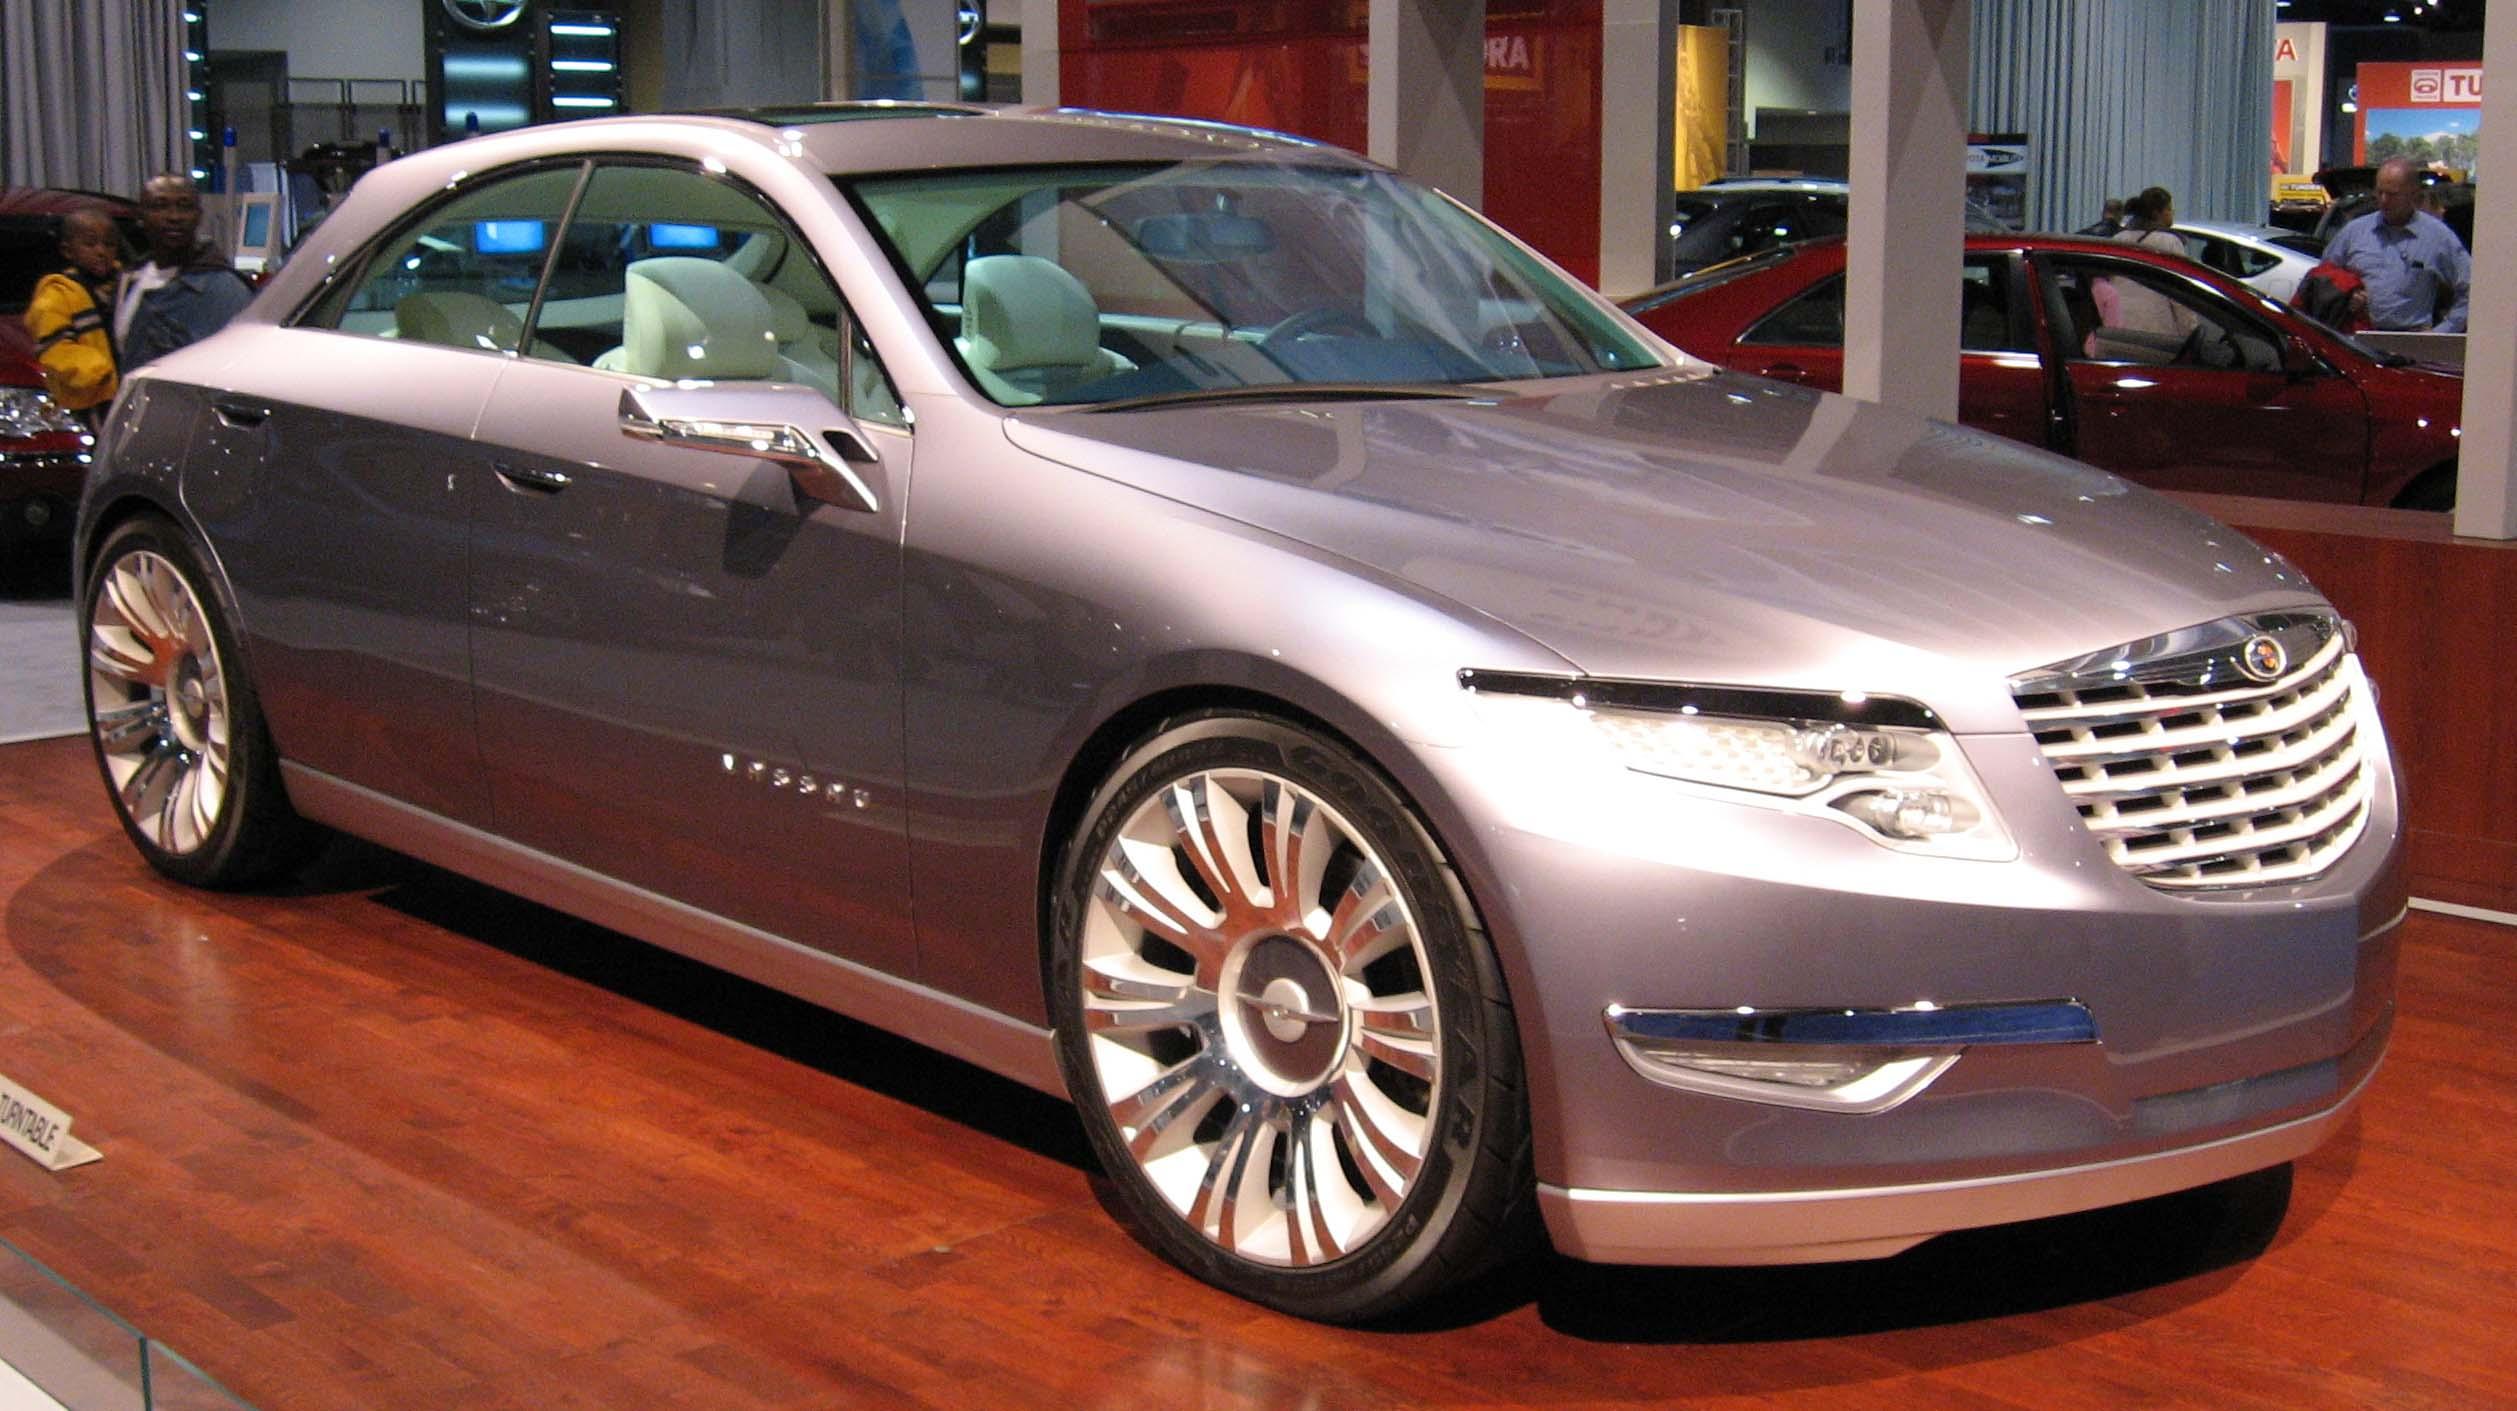 Chrysler concept nassau #3